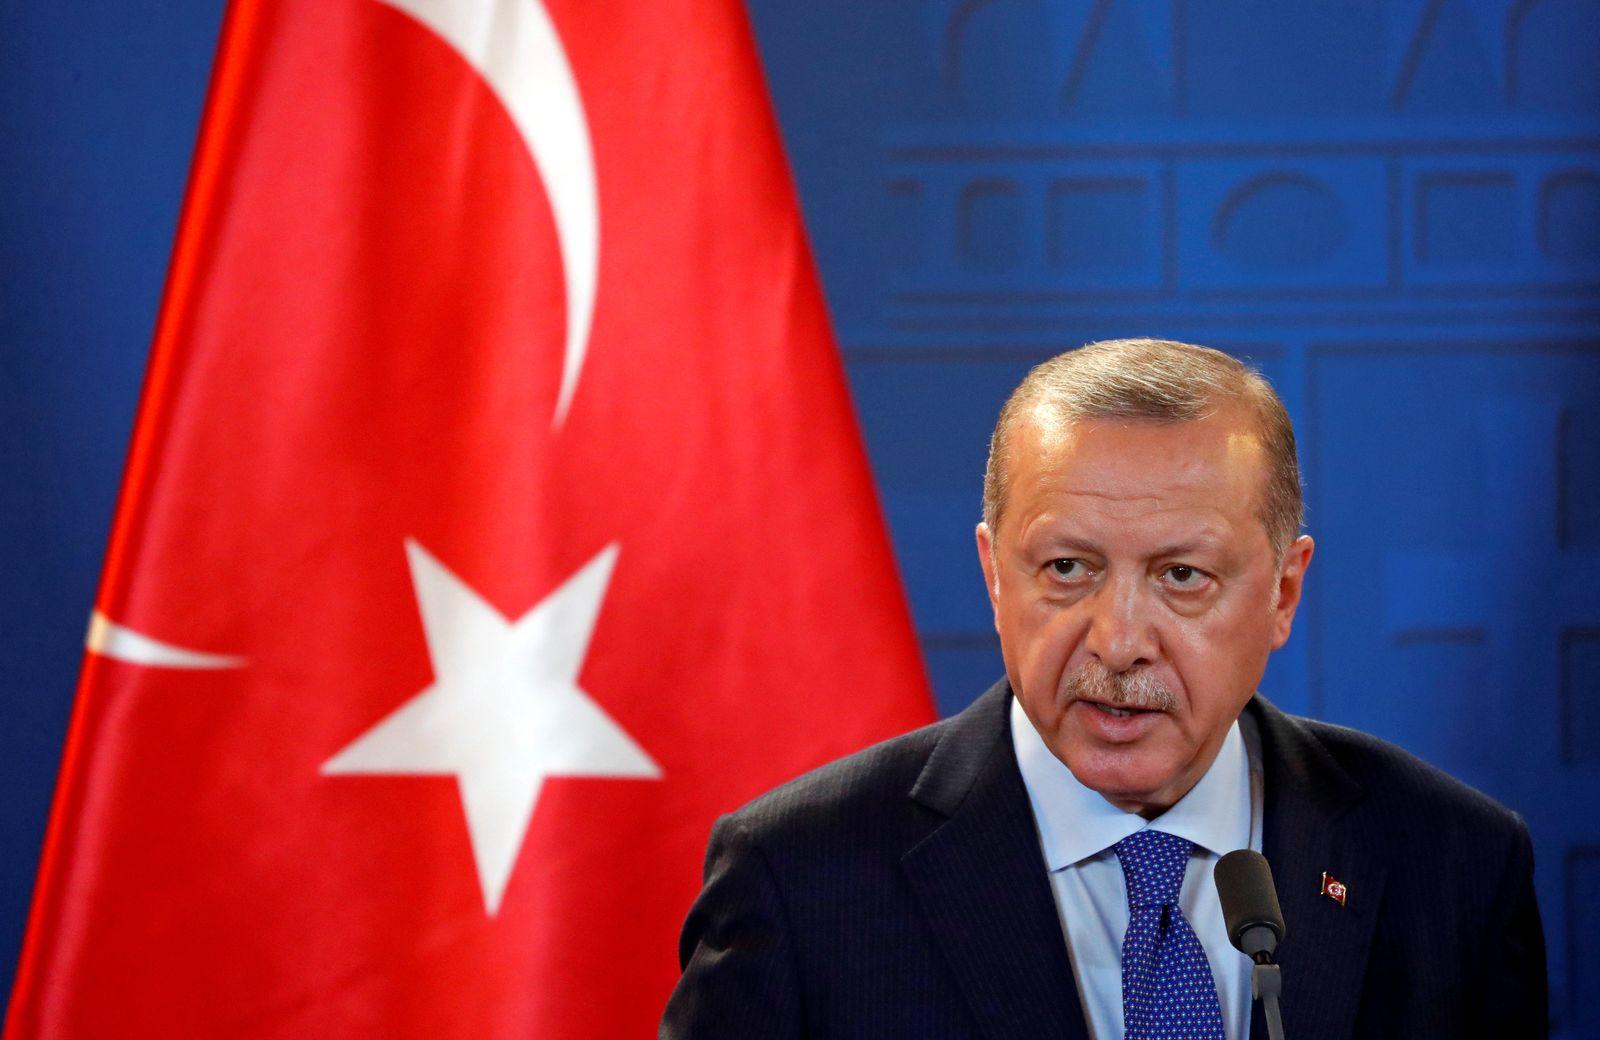 HUNGARY-TURKEY/GOVERNMENT